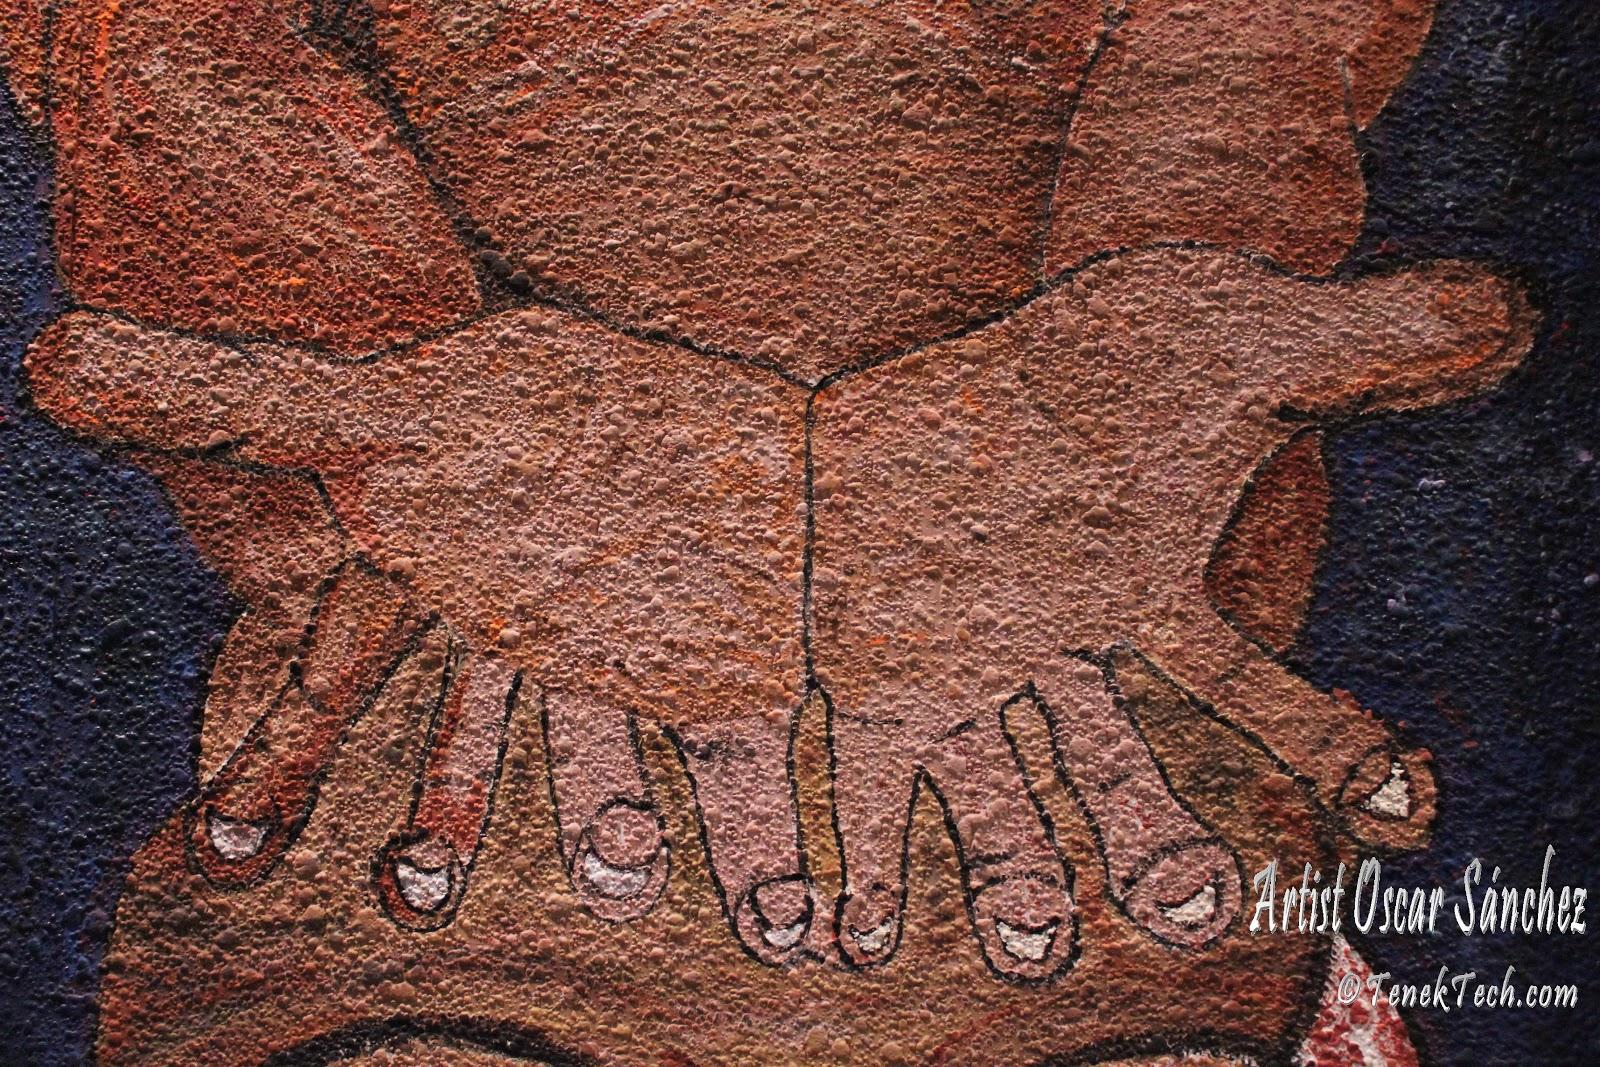 http://1.bp.blogspot.com/-NMls2Gx8Rj4/UJbcfA6QOwI/AAAAAAAAClo/YtTt5yZ0W88/s1600/vancouverdayofthedeadvanmusicartexhibitionmusterstudios2012_11_03_9204.JPG